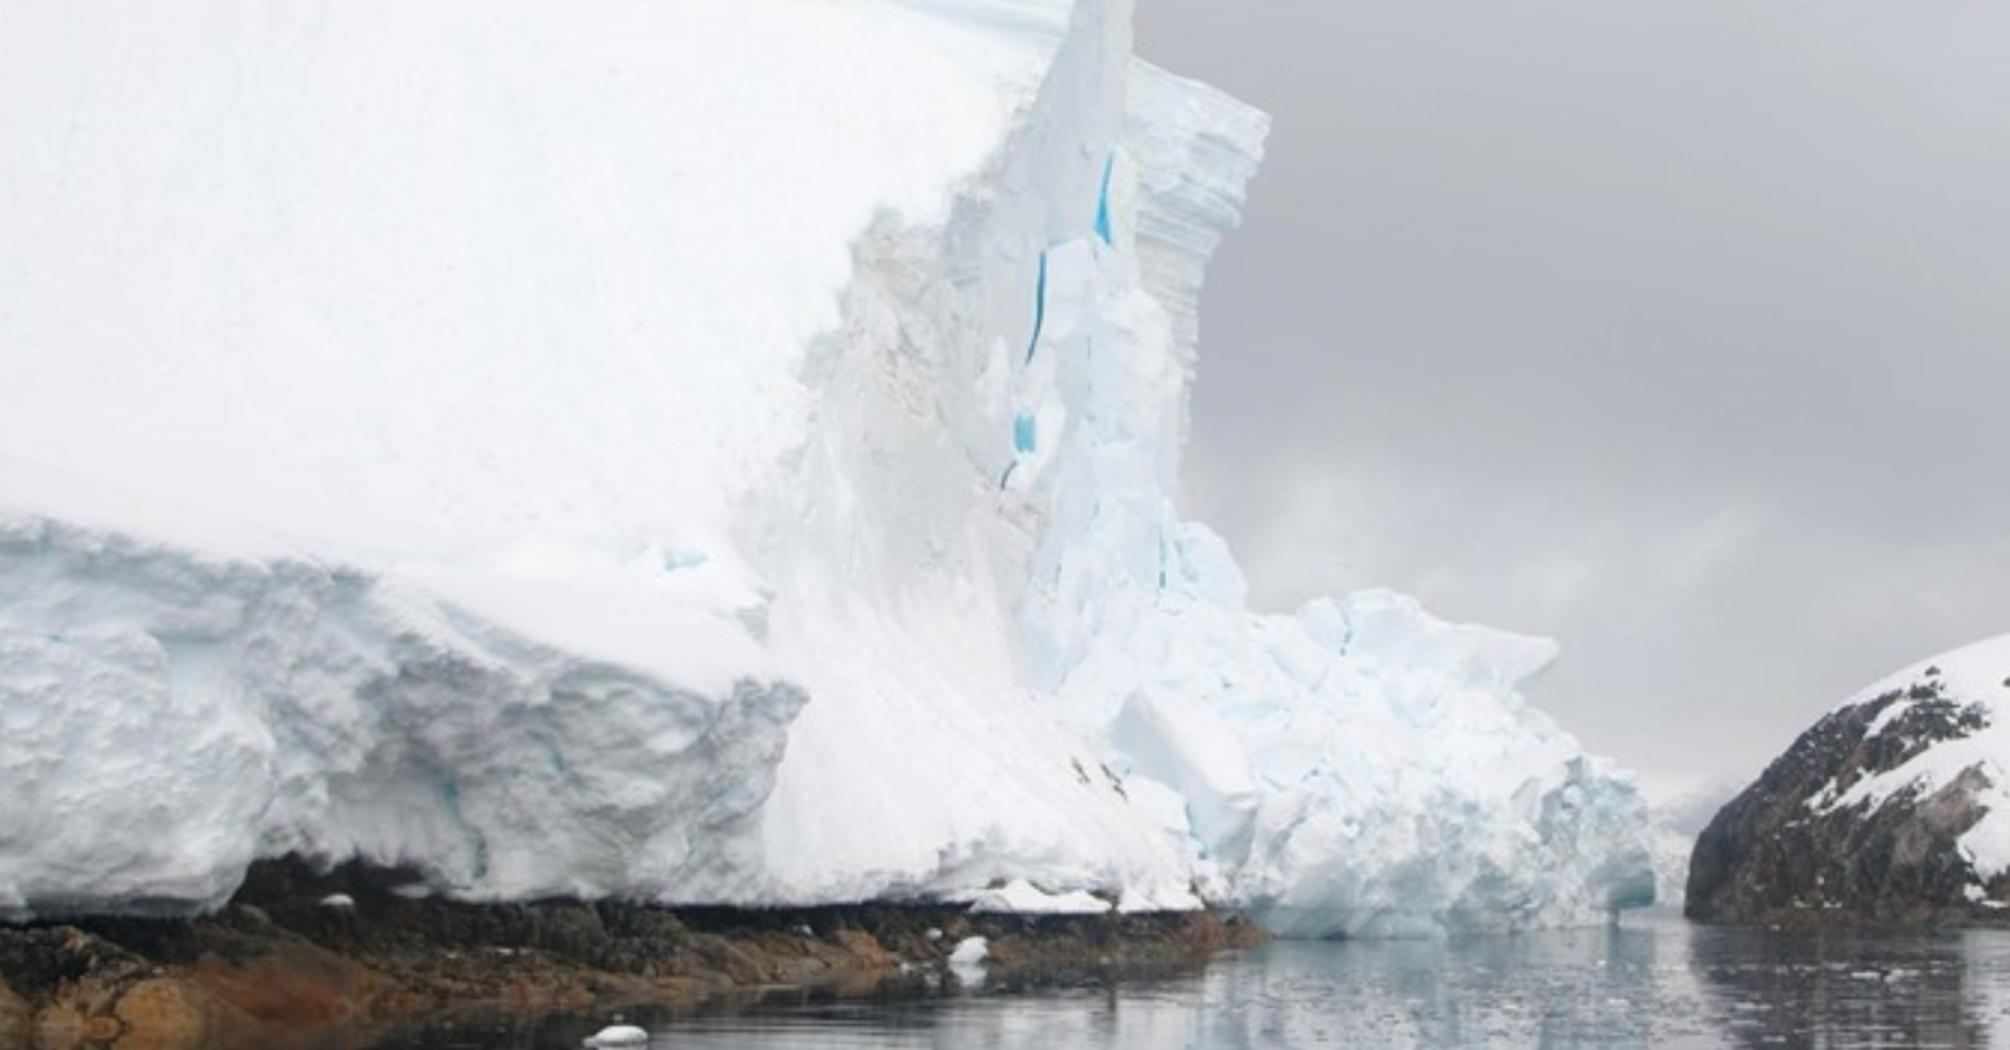 В Антарктиде откололся кусок ледника